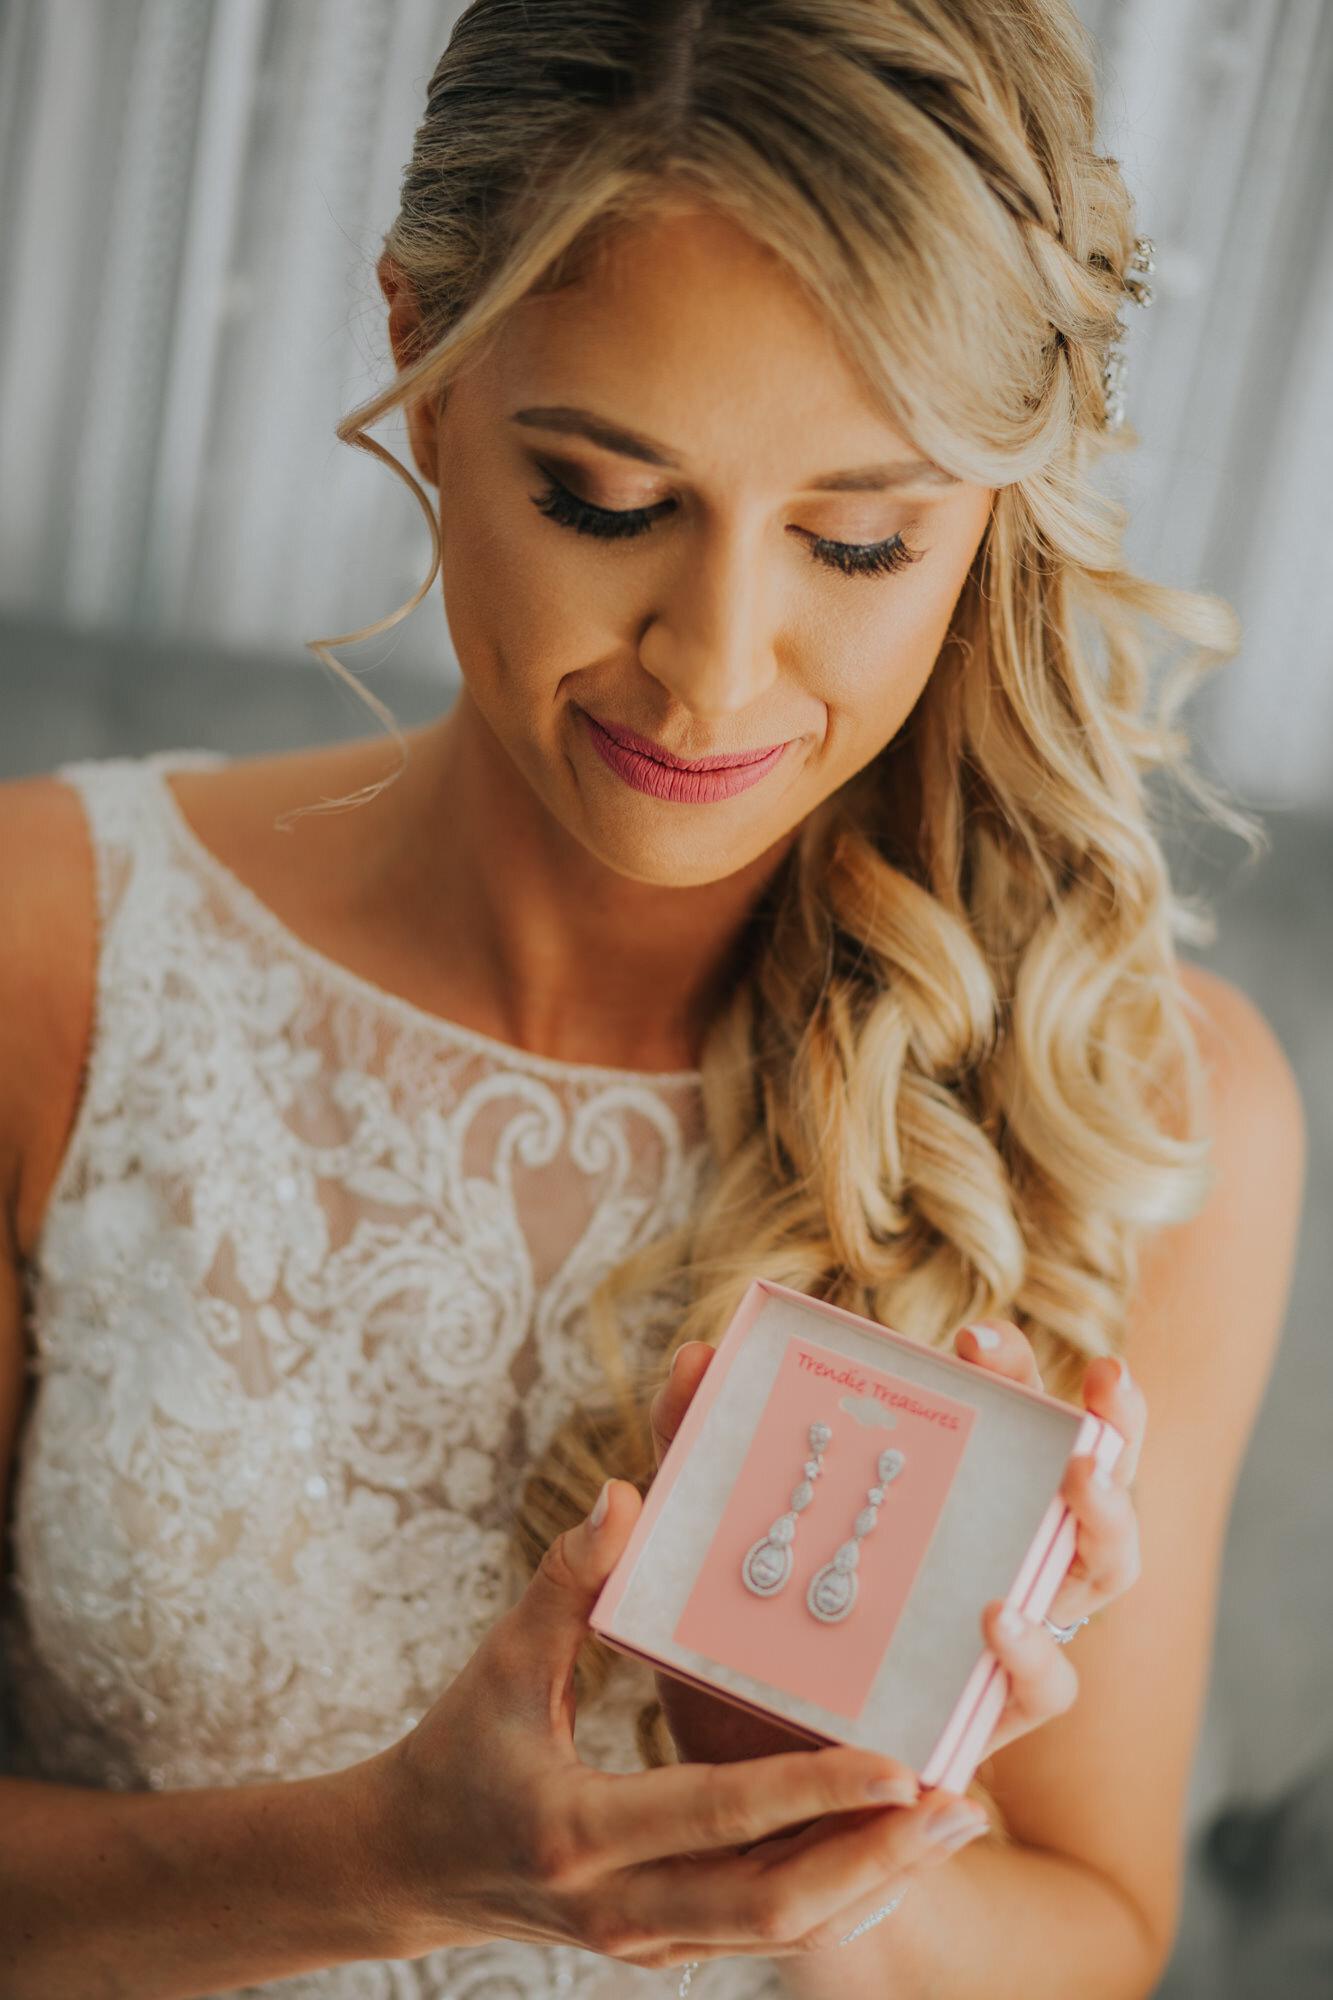 067Sean_Emily_Wedding_3-30-19.jpg